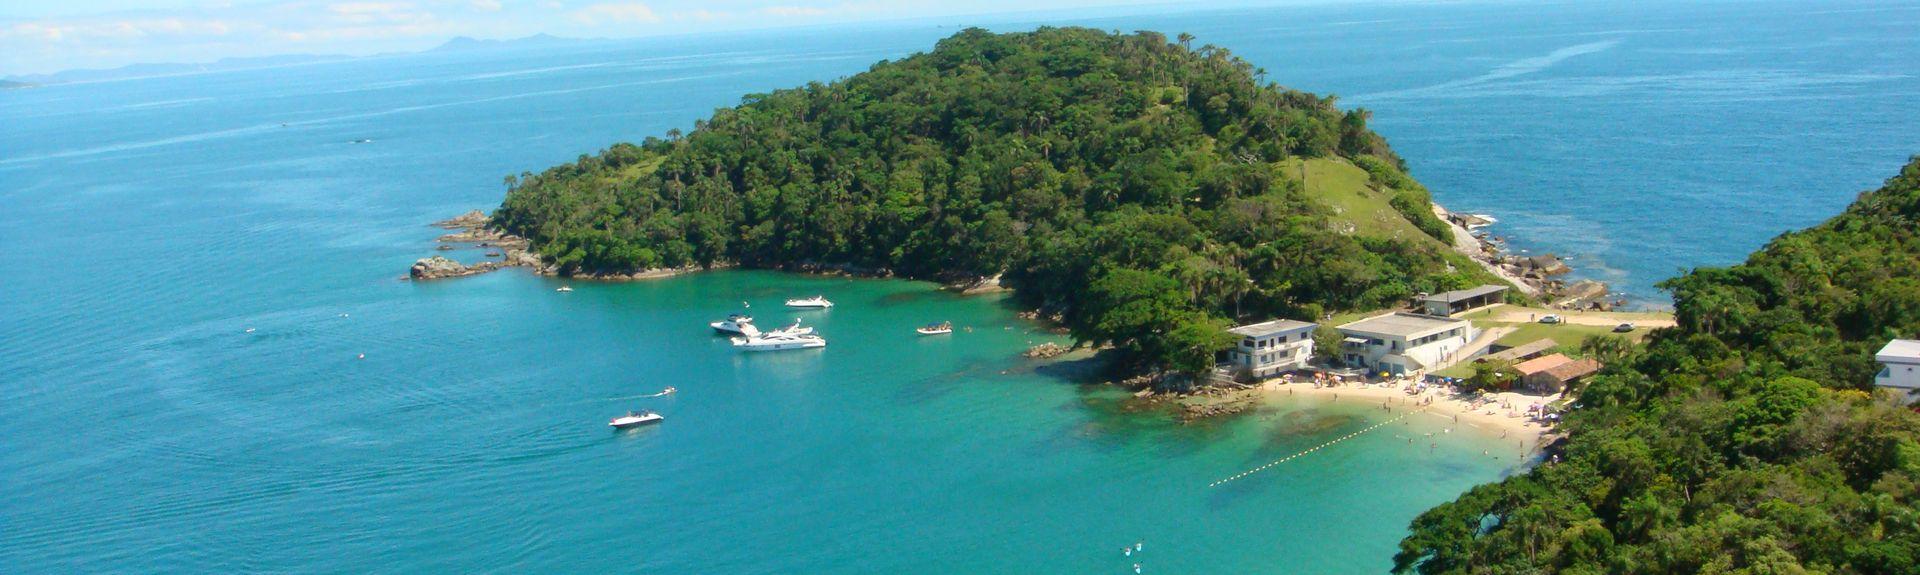 Quatro Ilhas, Bombinhas, Santa Catarina (staat), Brazilië